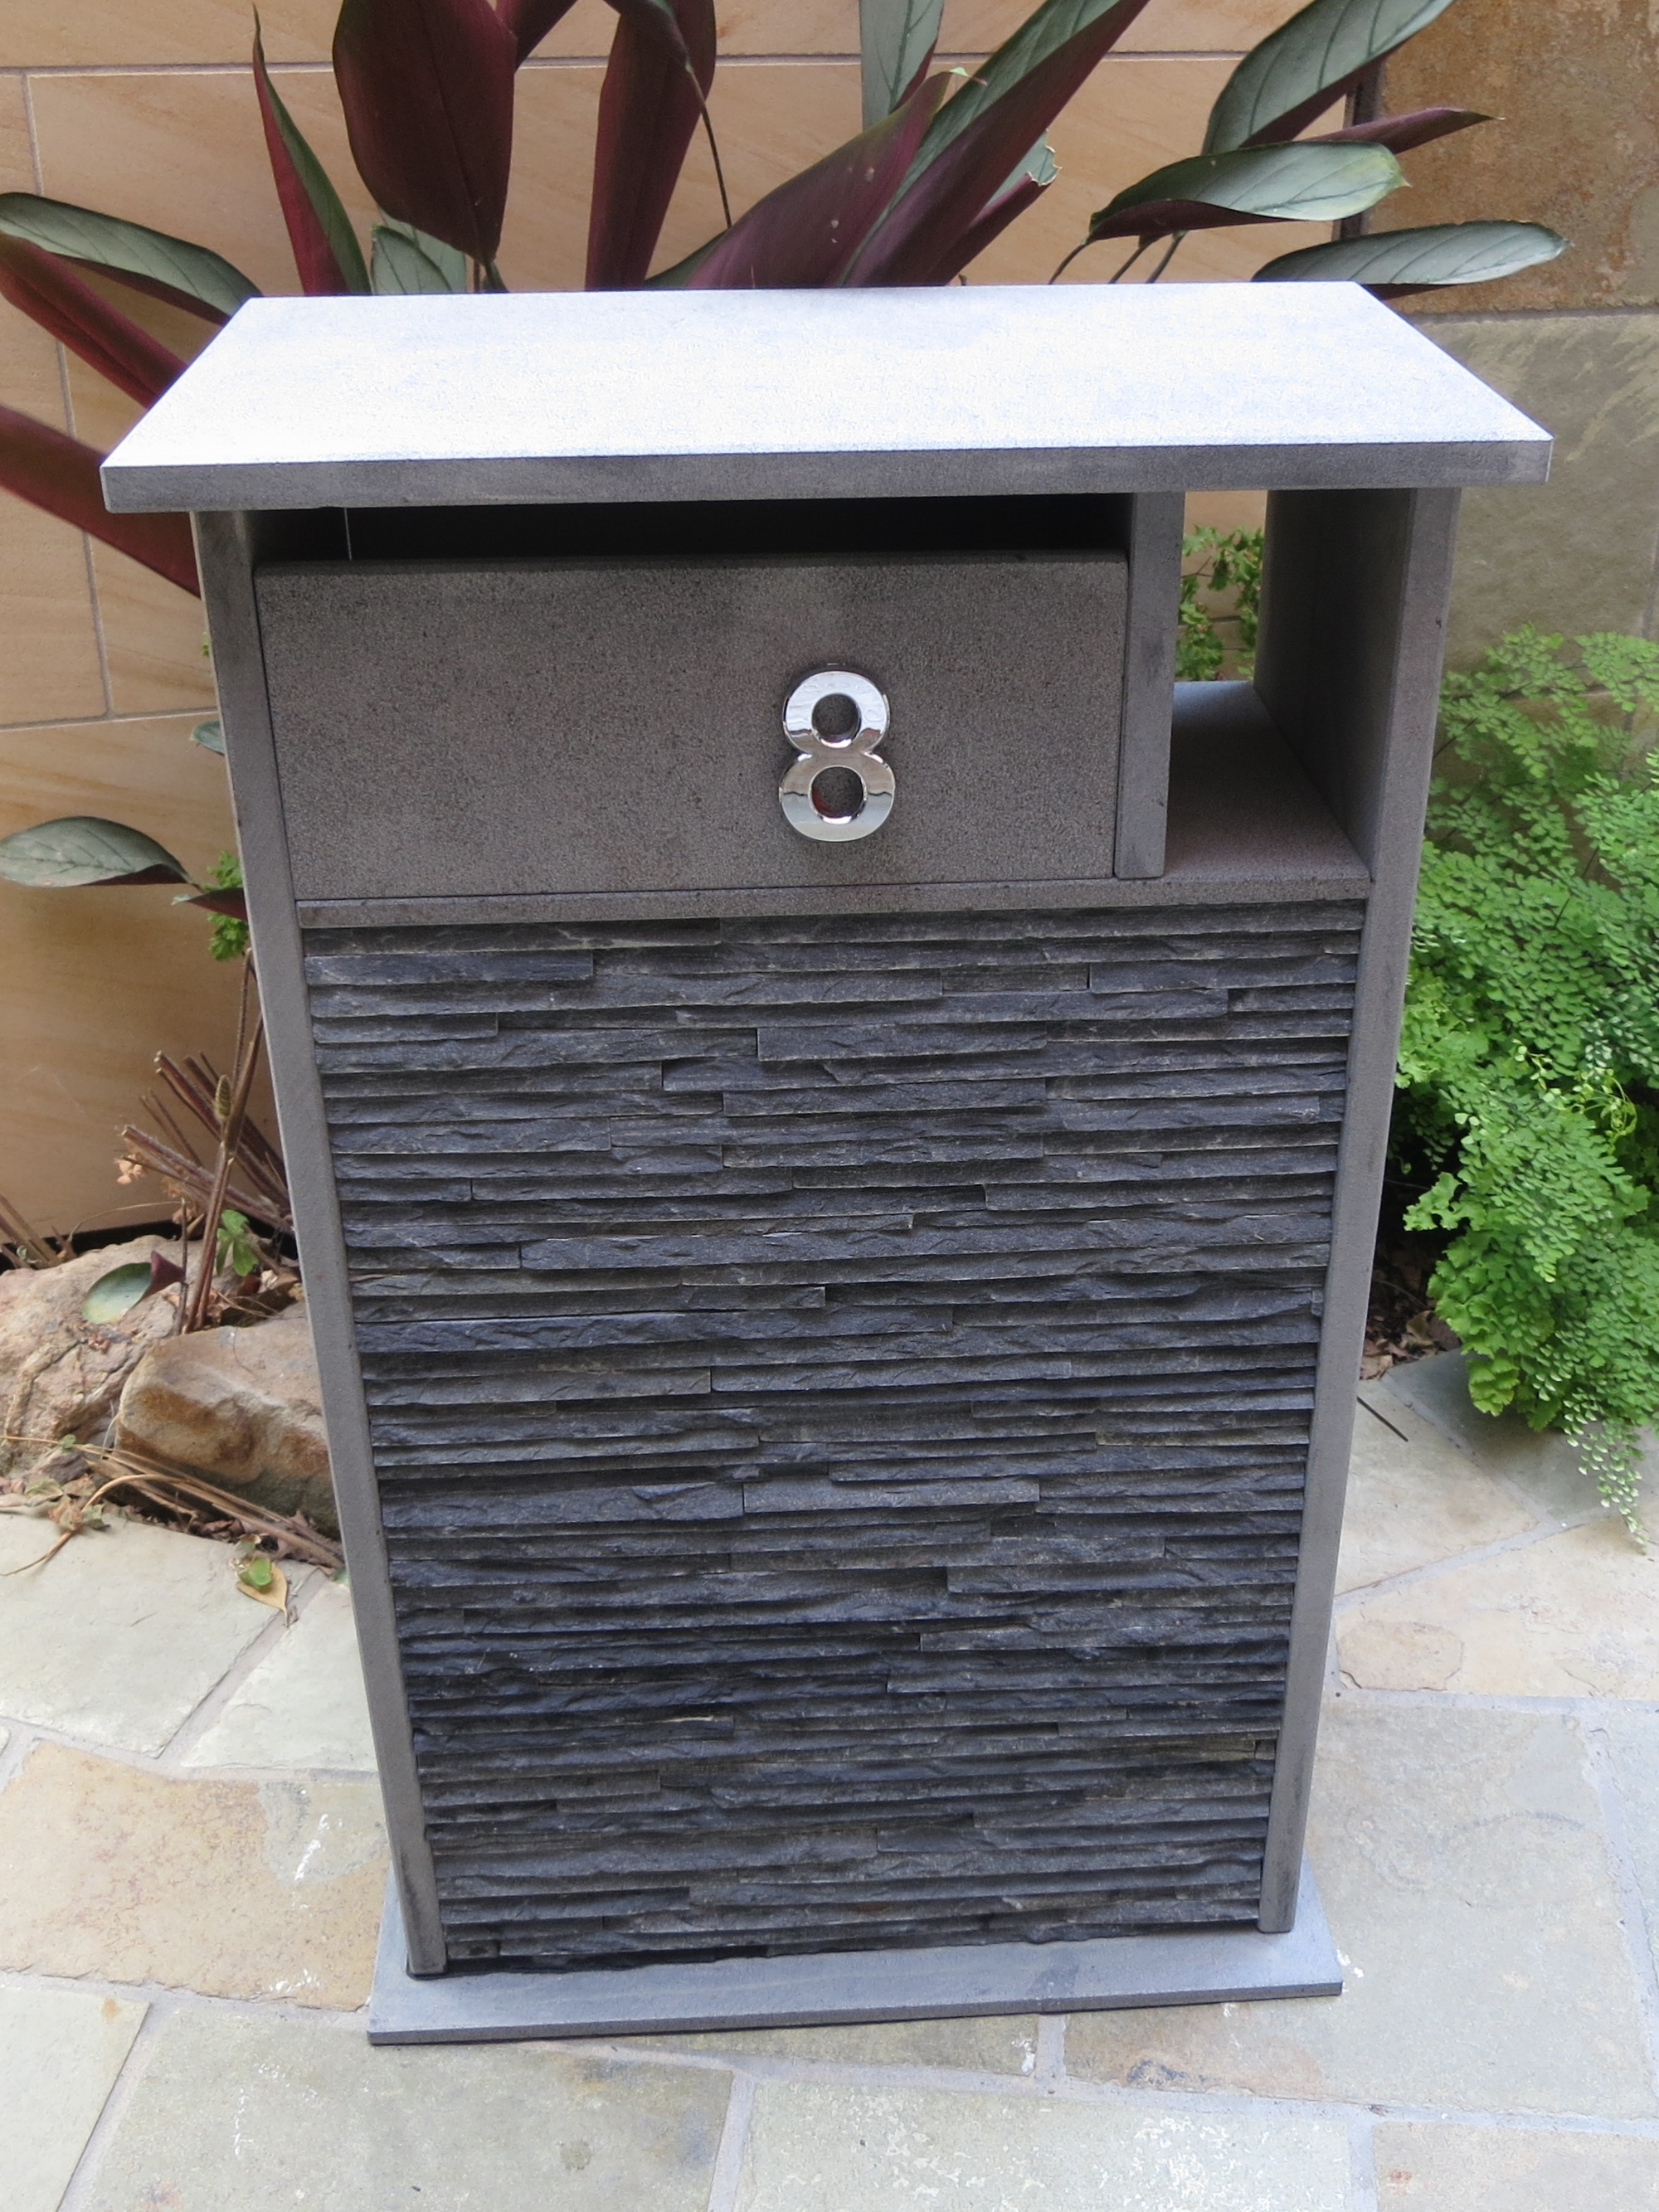 001 Blue stone custom made letterbox.JPG